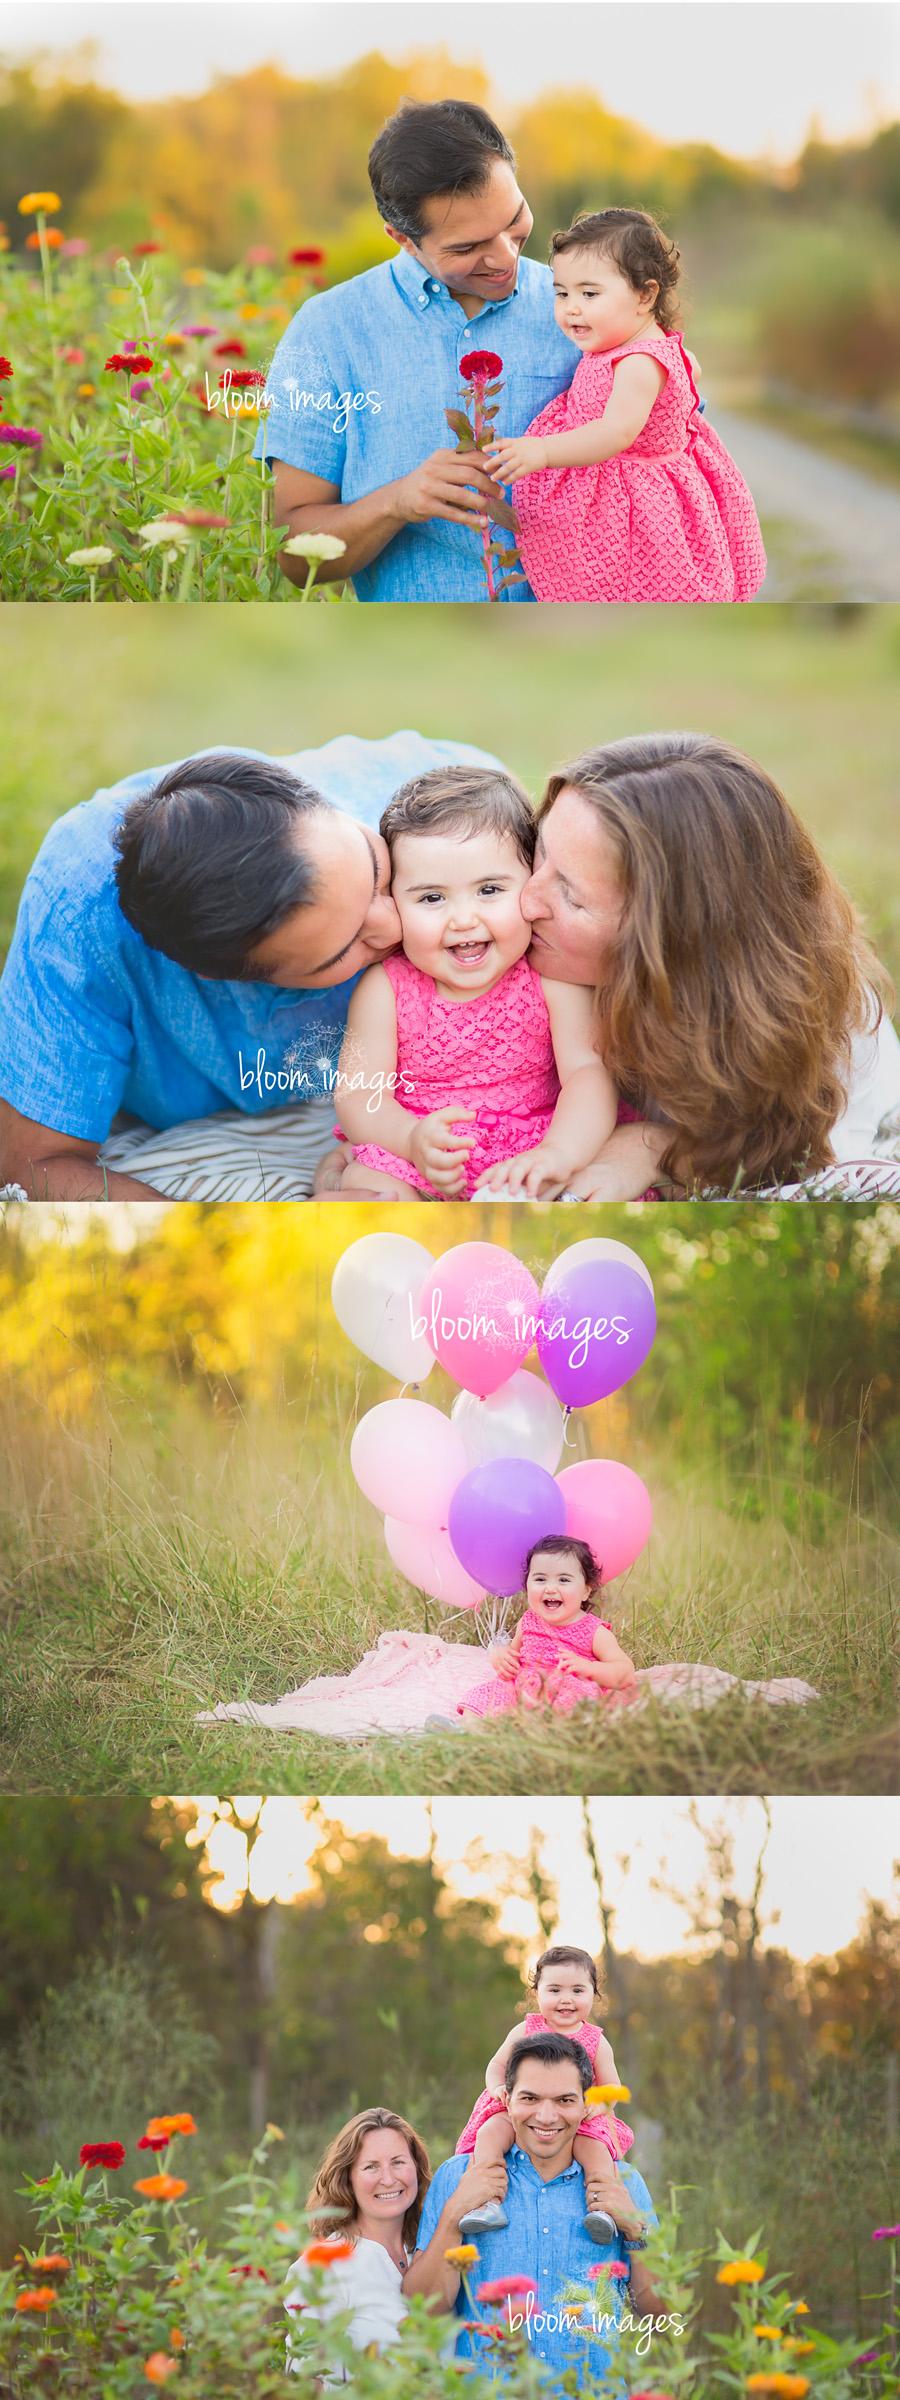 Baby-Photographer-Ashburn-VA-Family-Photo-Session-in-Northern-VA